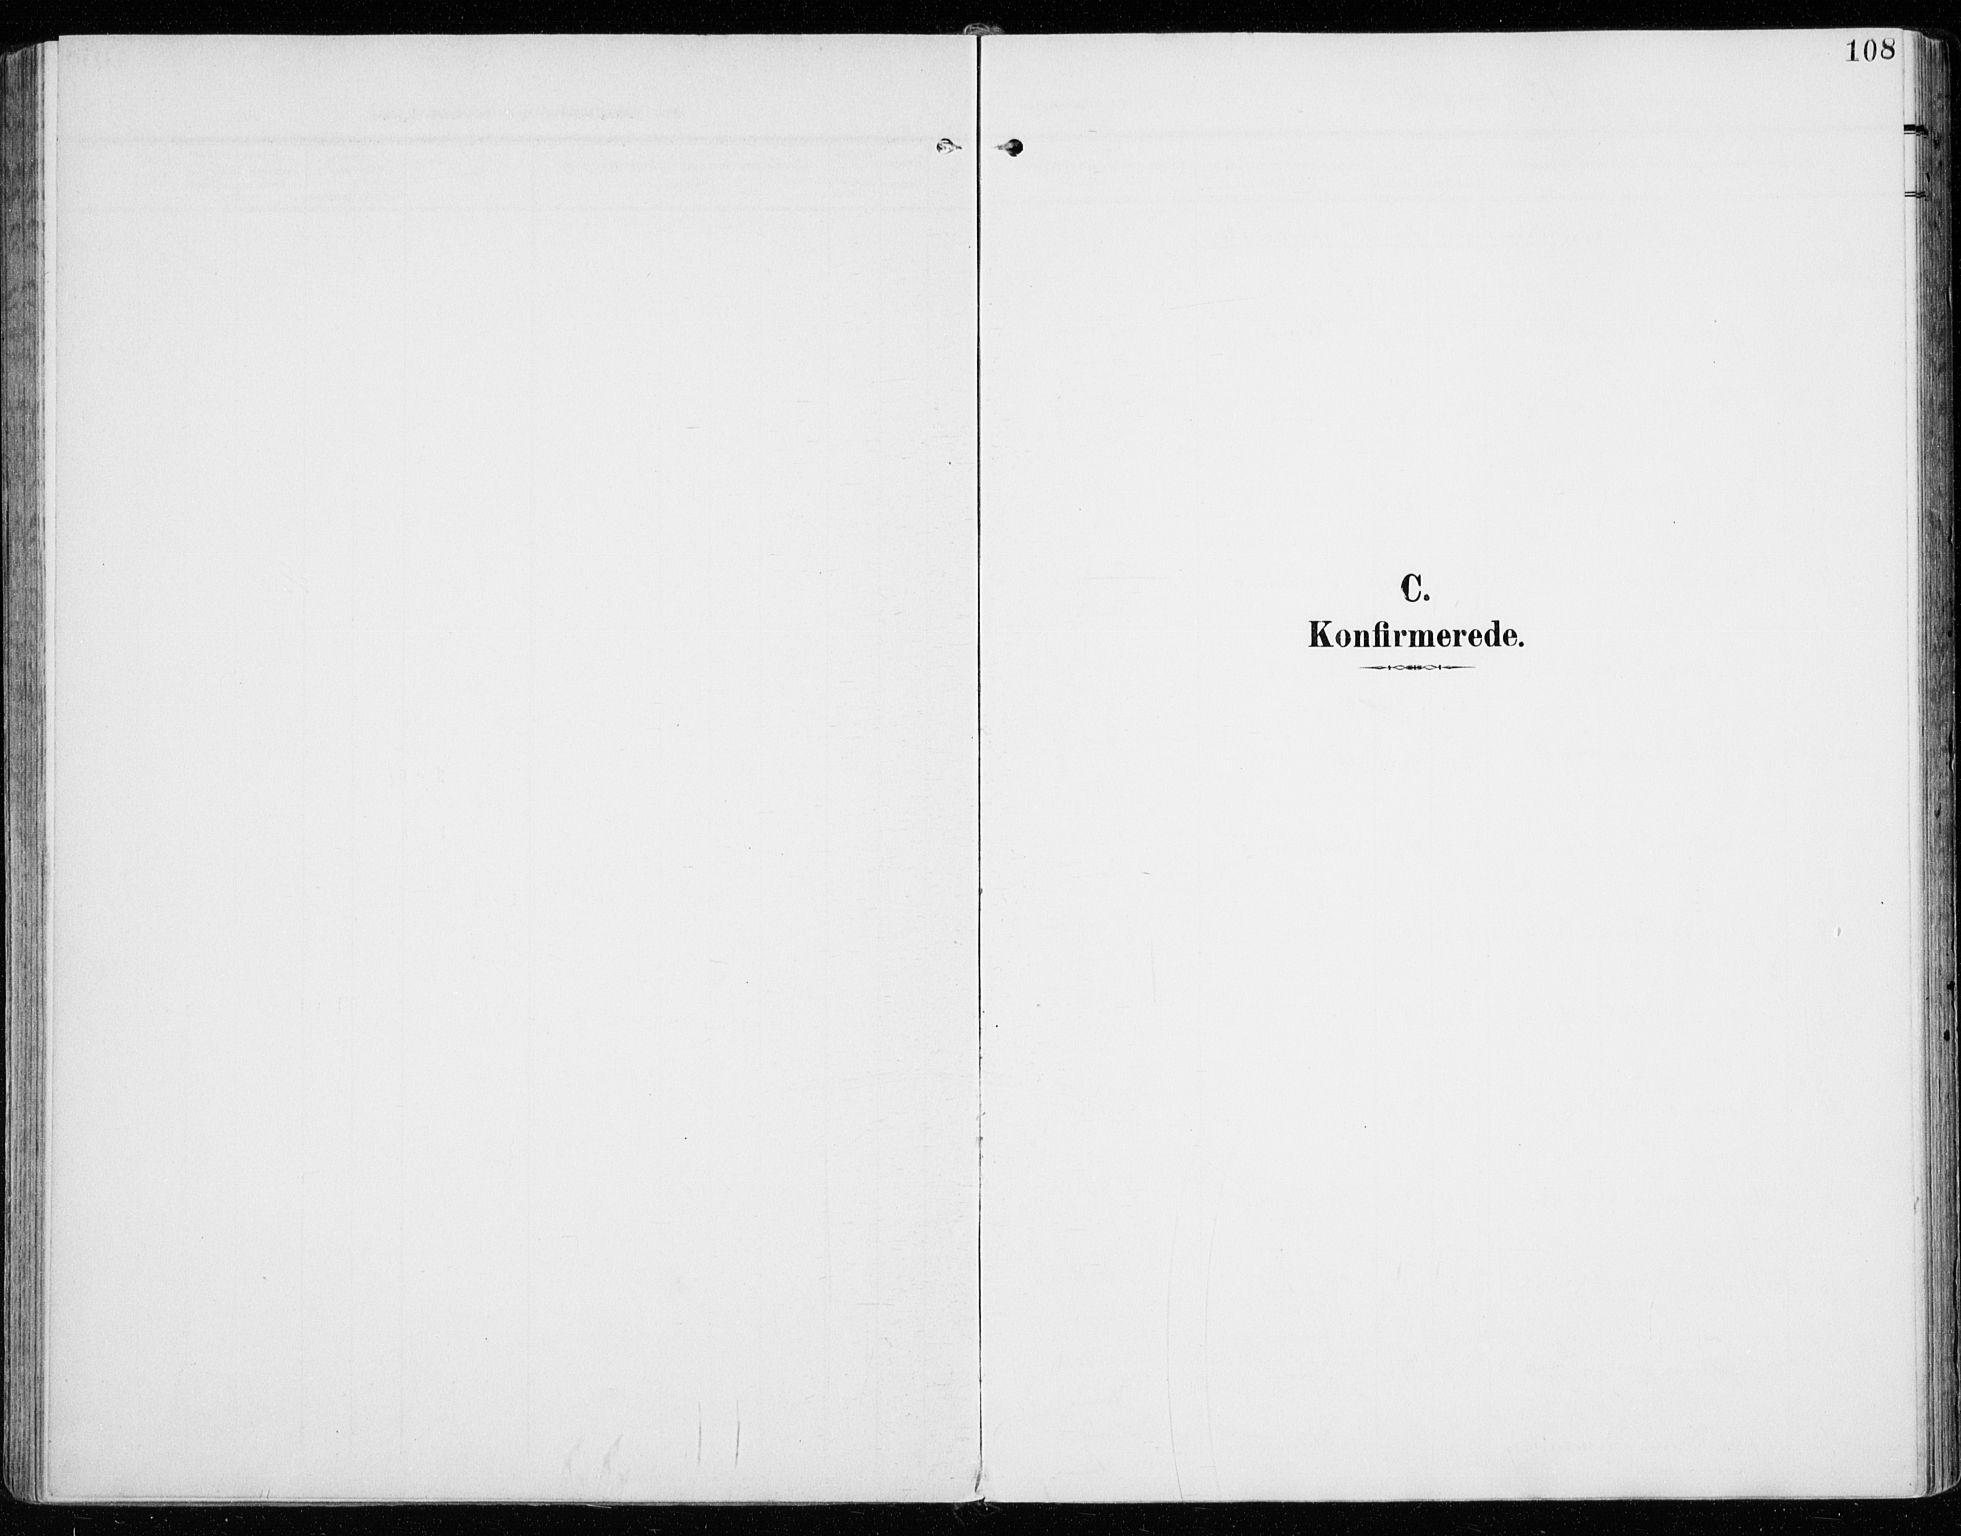 SAH, Vardal prestekontor, H/Ha/Haa/L0016: Ministerialbok nr. 16, 1904-1916, s. 108